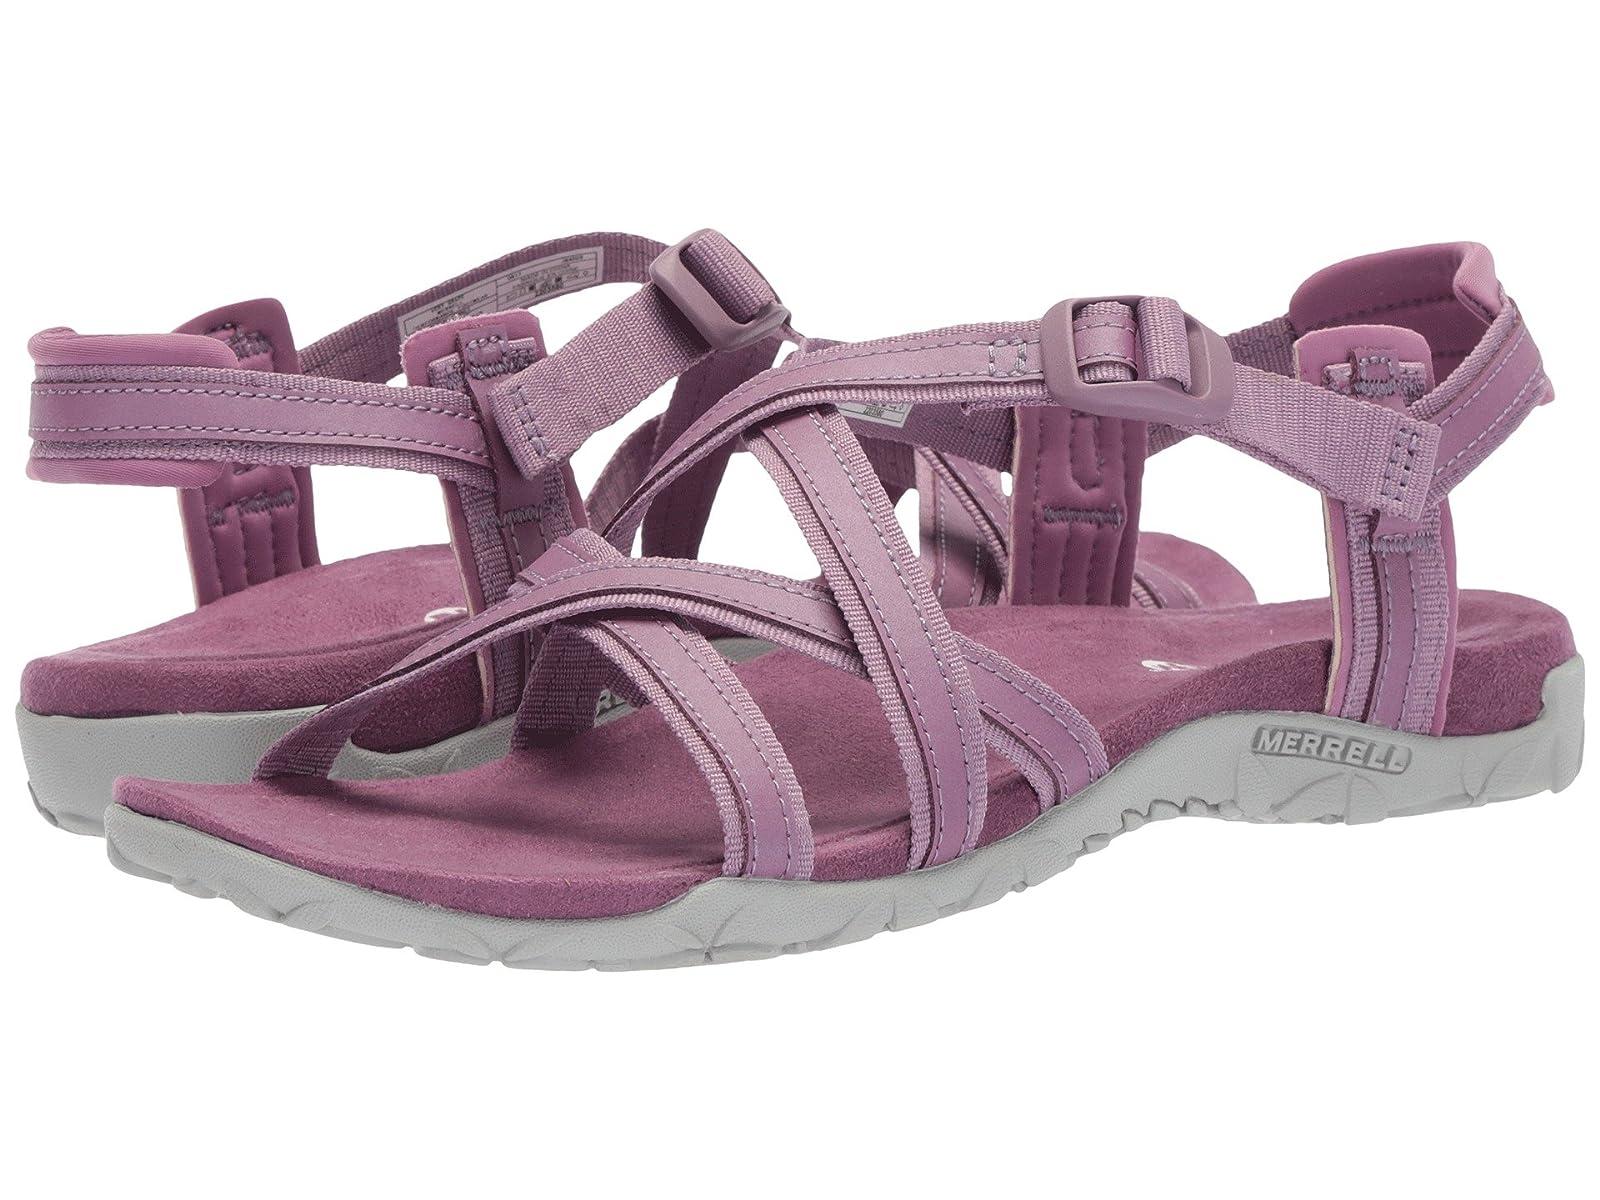 Merrell Terran Ari LatticeCheap and distinctive eye-catching shoes